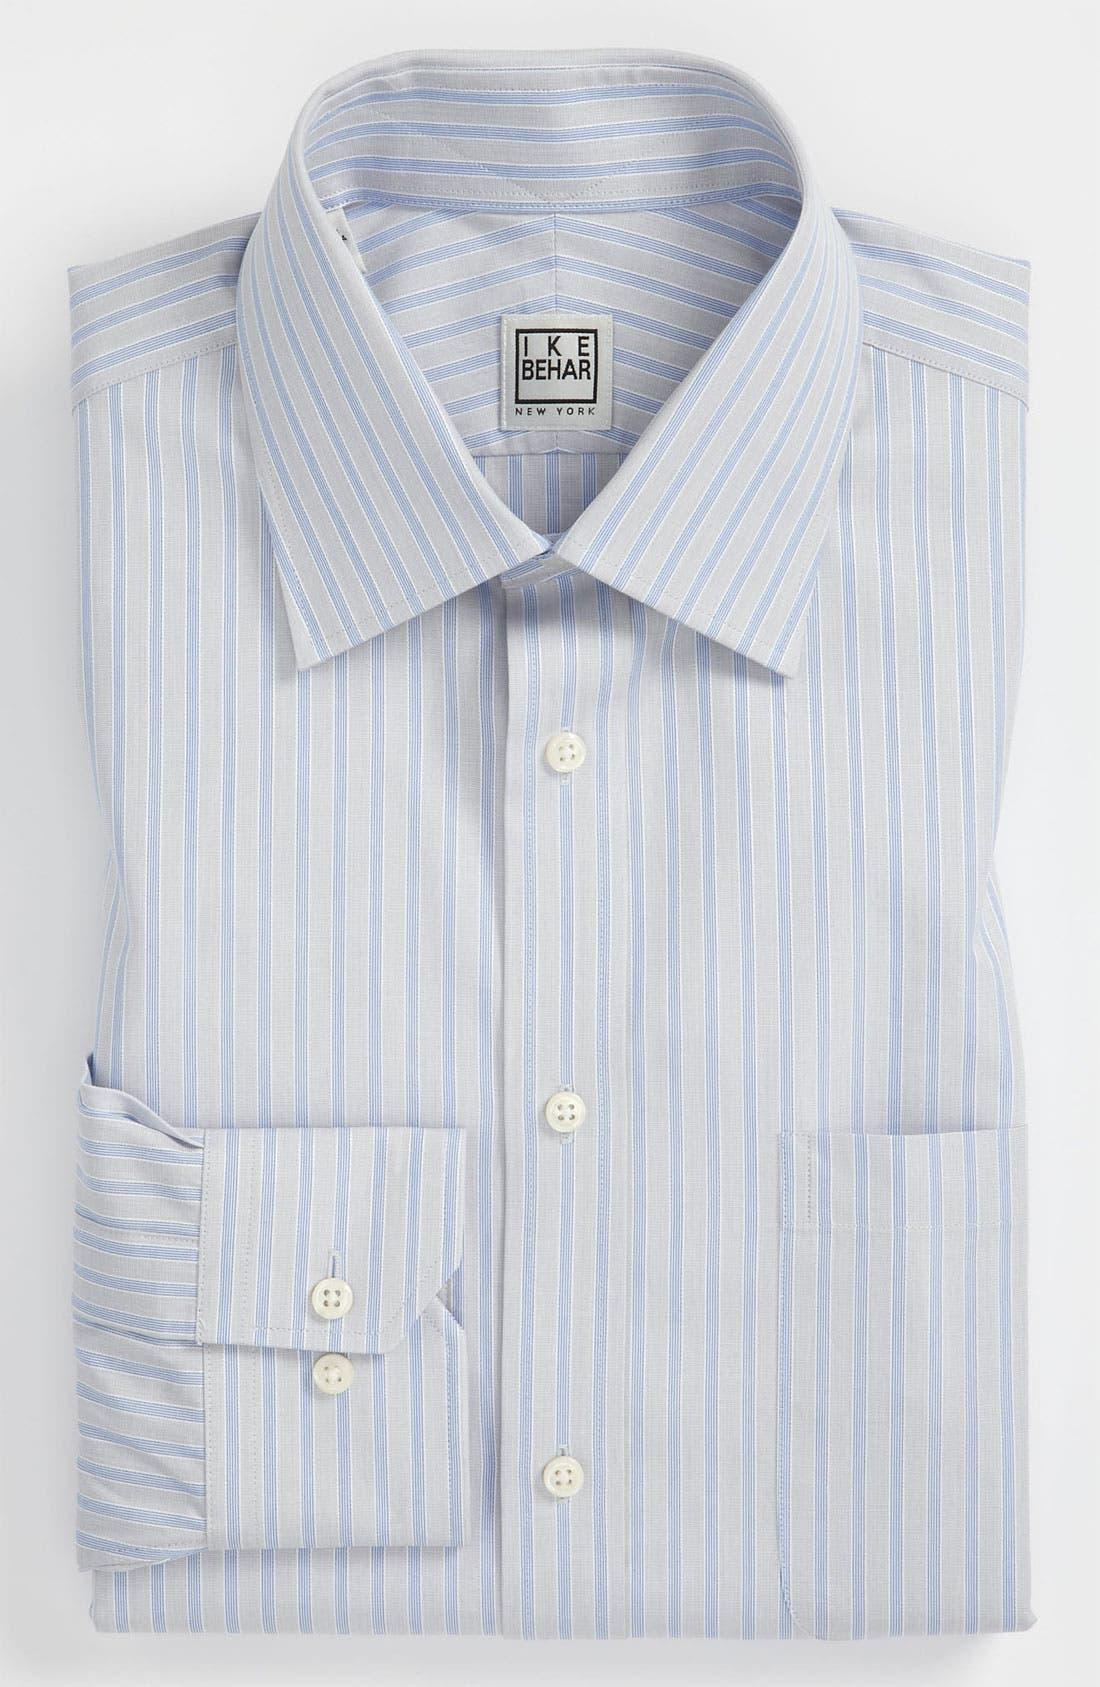 Alternate Image 1 Selected - Ike Behar Regular Fit Dress Shirt